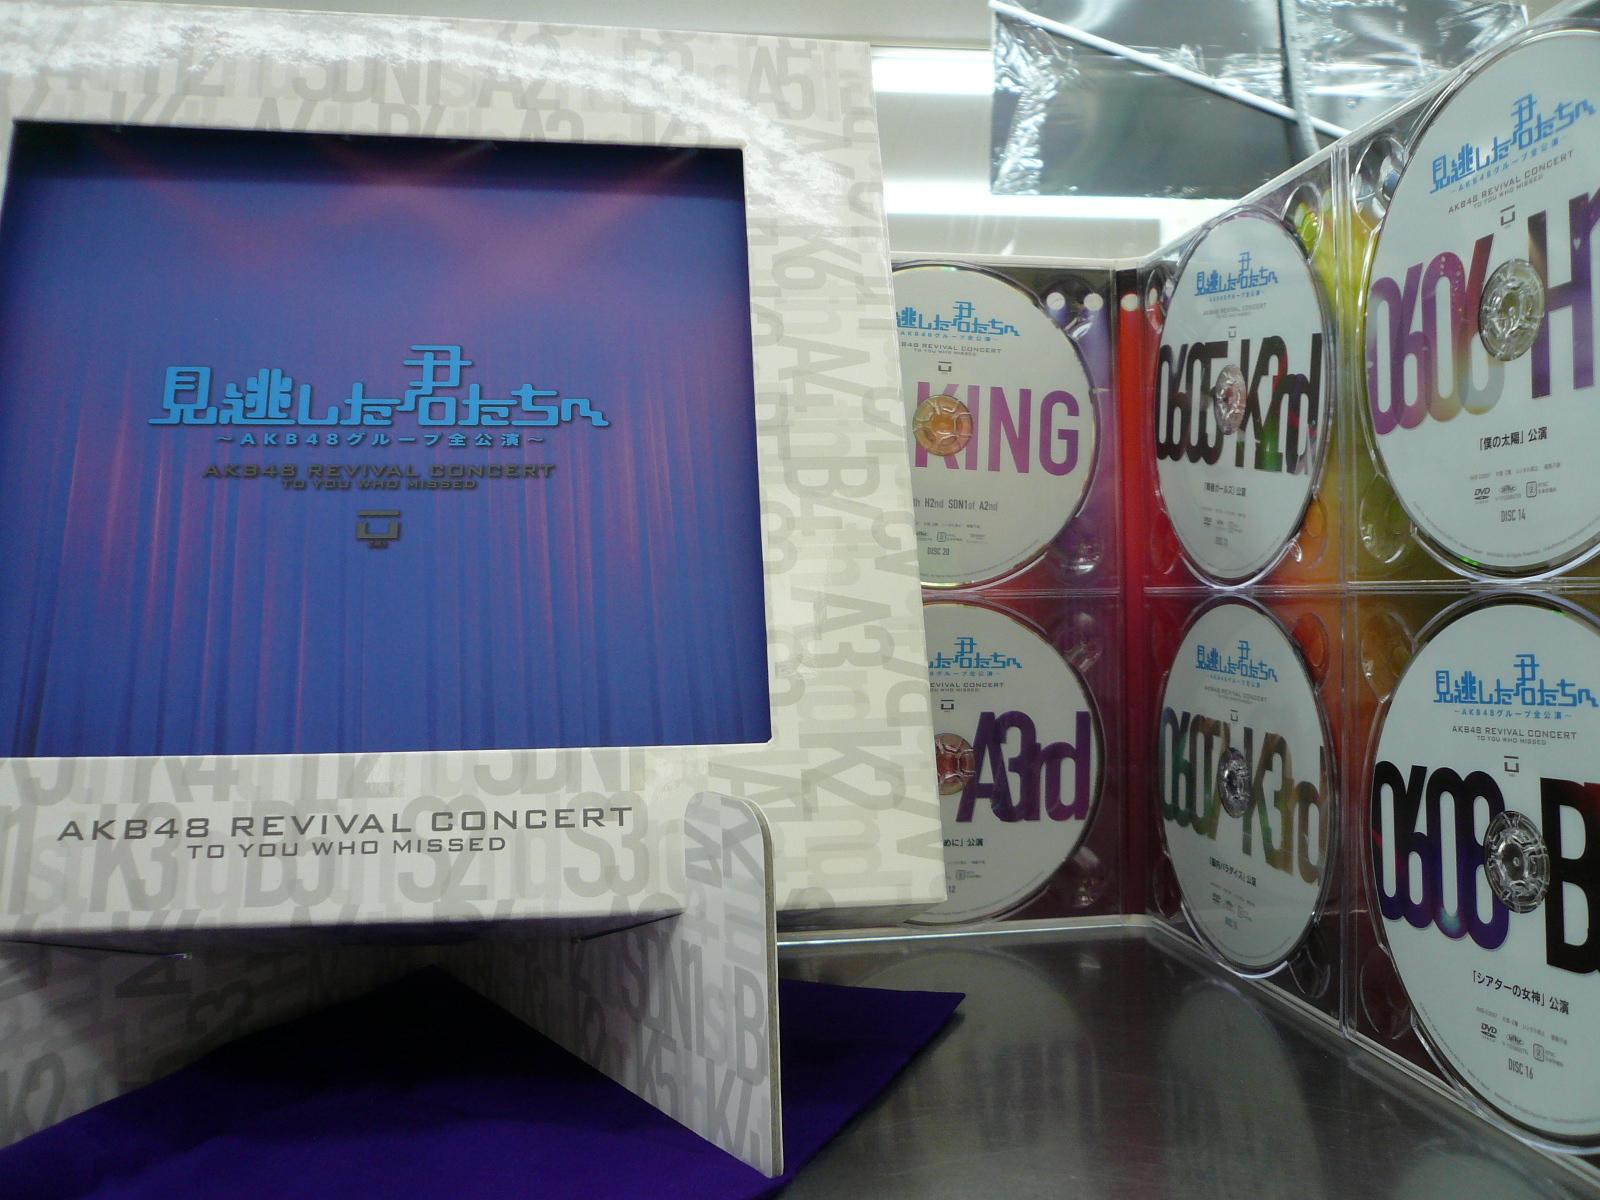 AKB48 を売るなら 総合リサイクルショップフライズ佐賀店 佐賀市 買取り